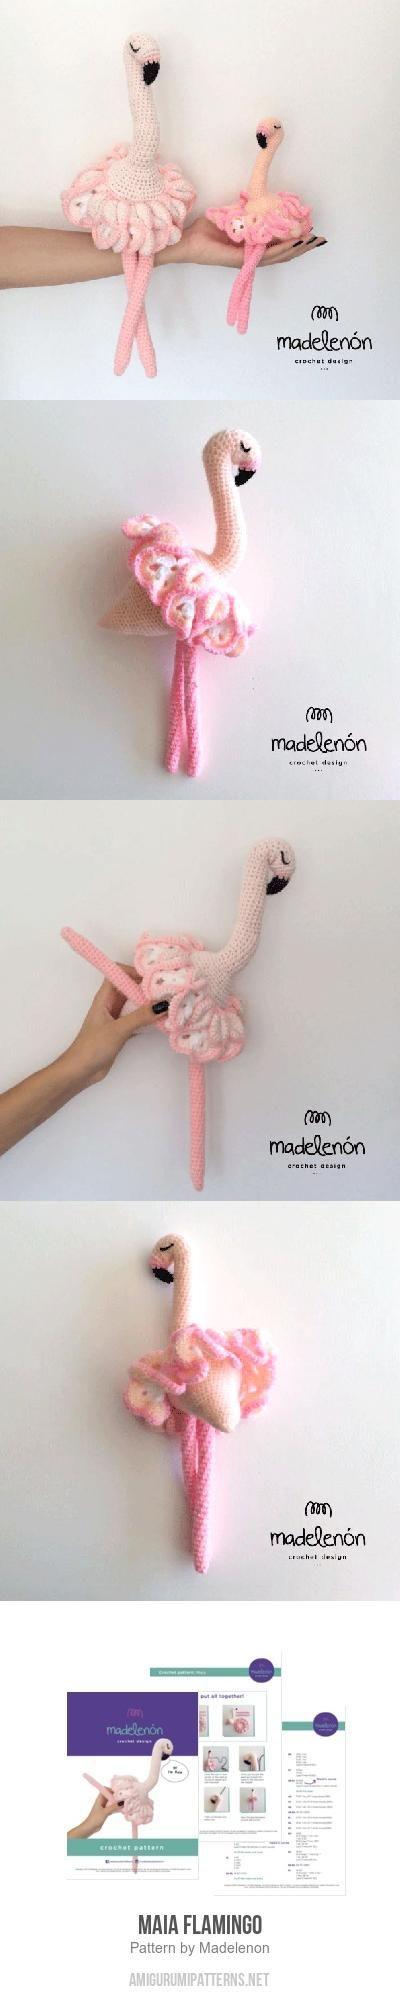 Maia Flamingo Amigurumi Pattern Crochet Pinterest Crochet